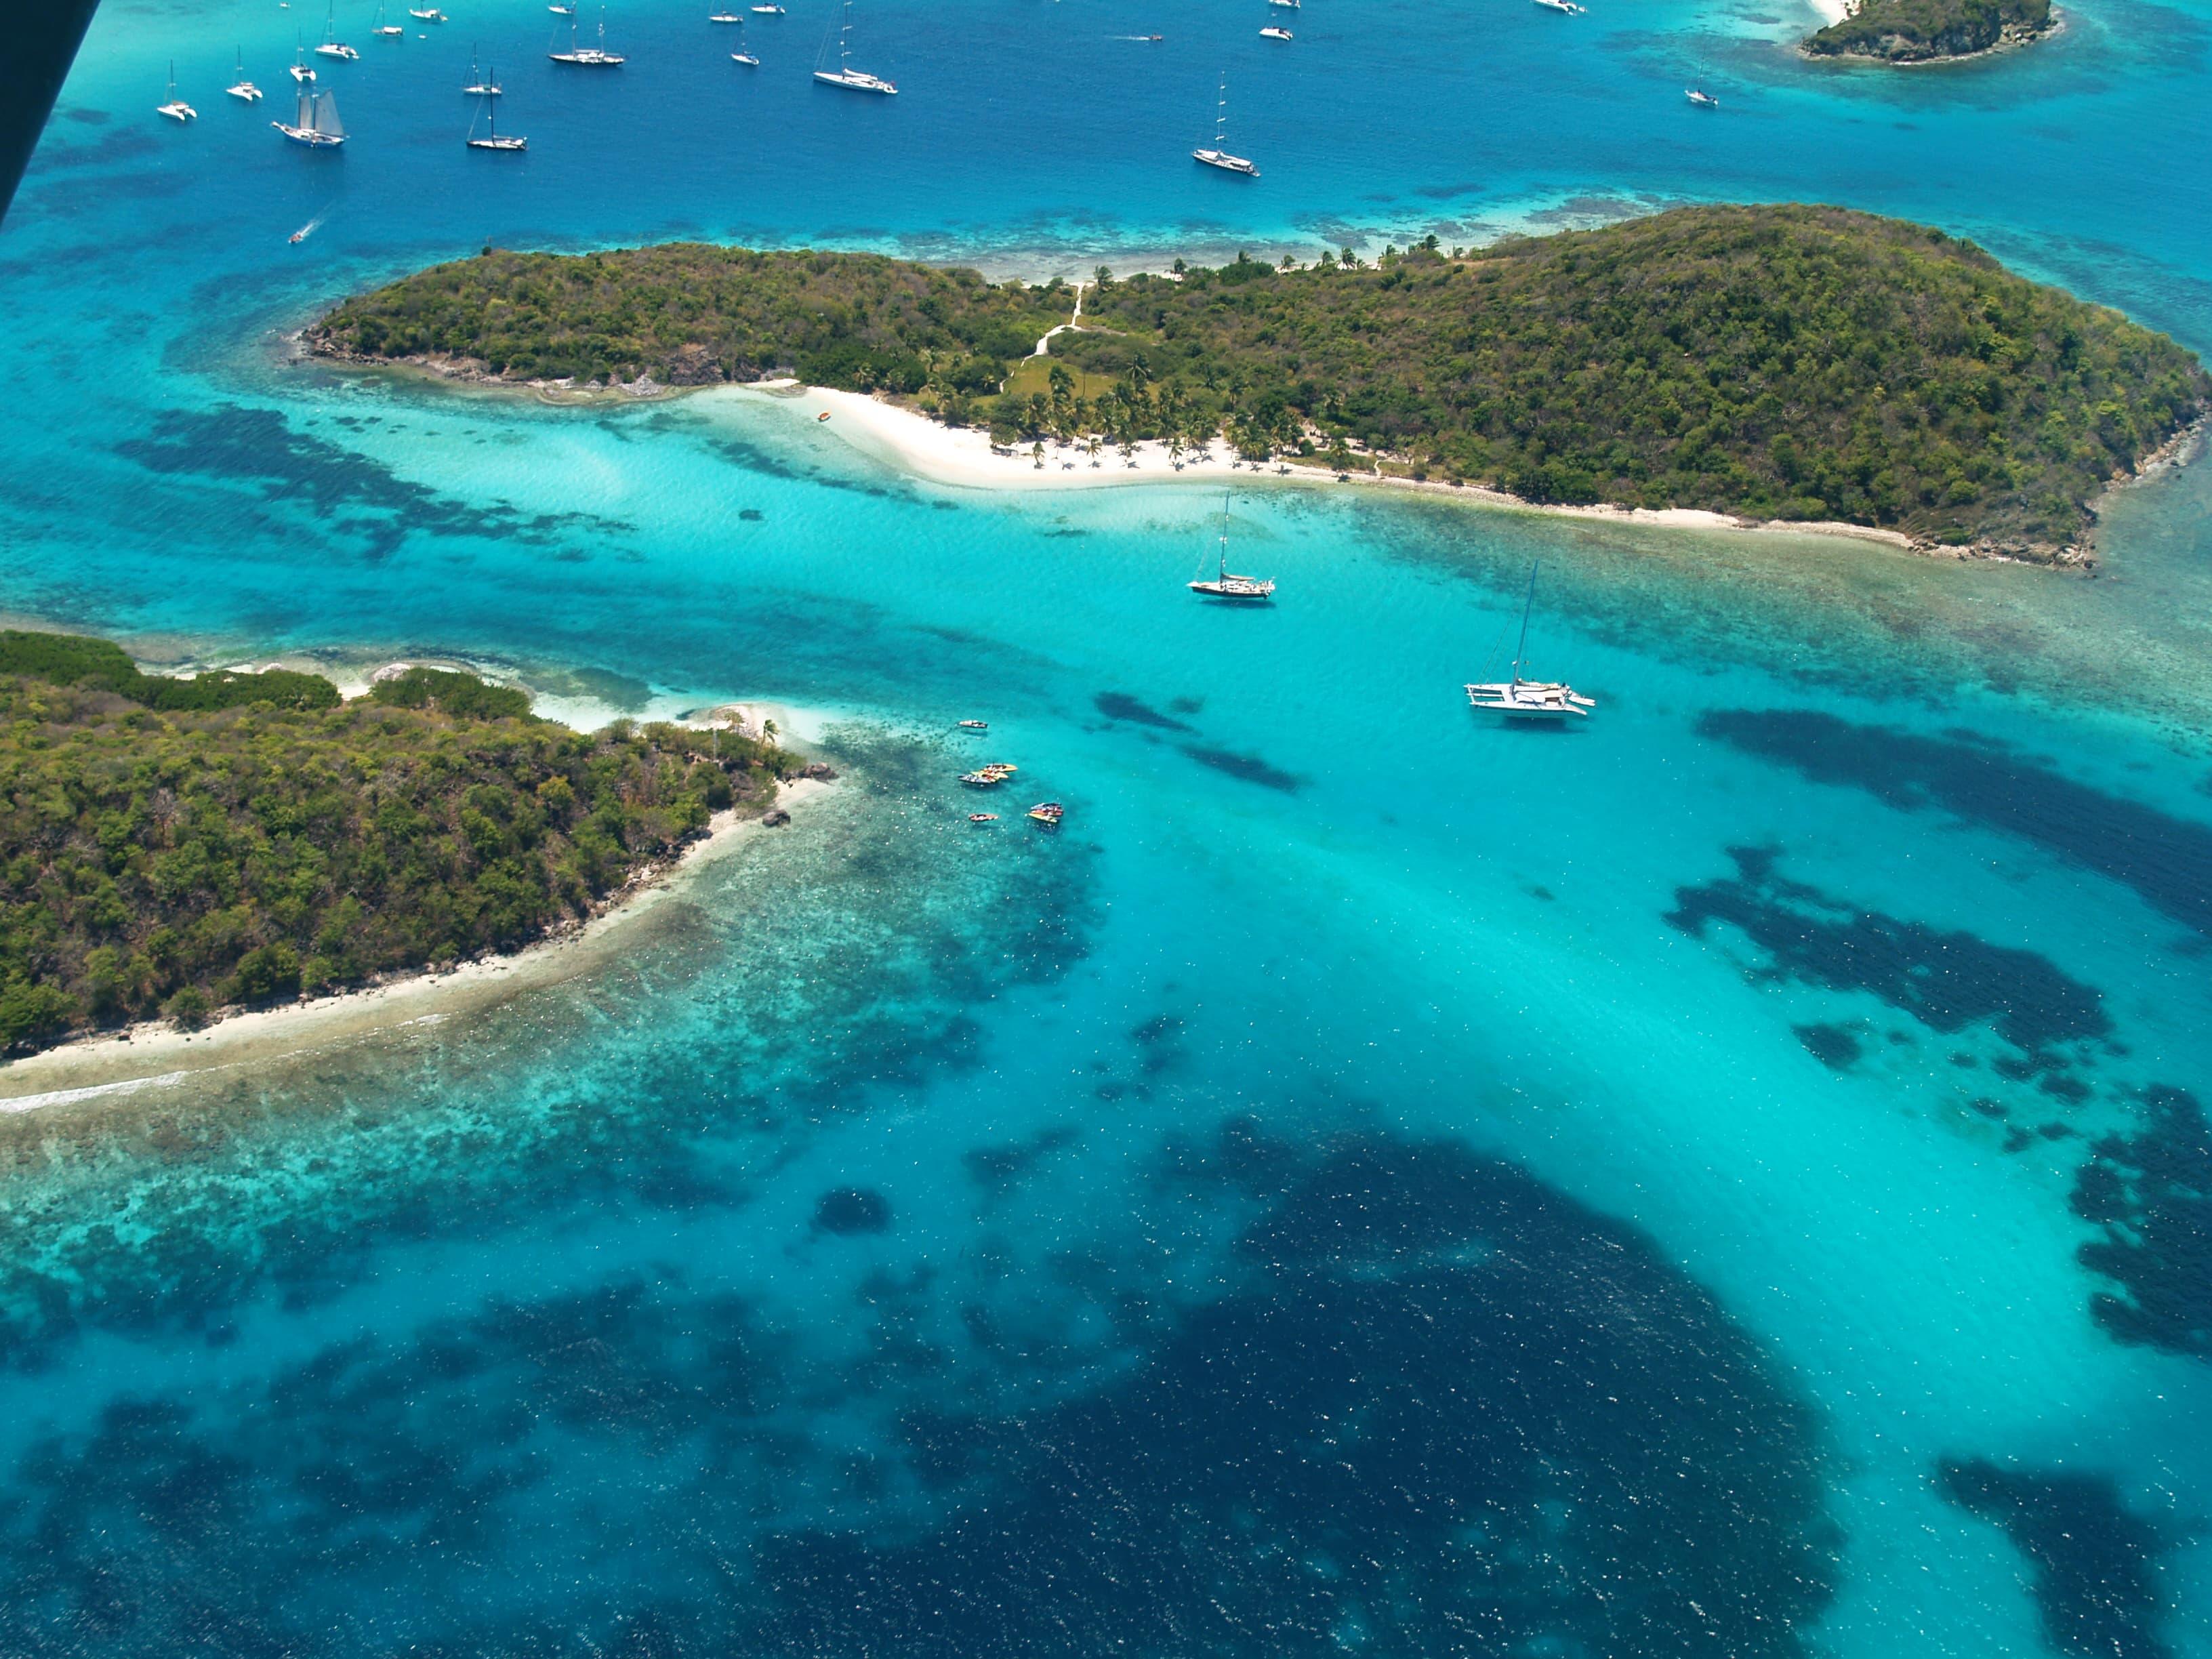 Noleggio Barche Le Marin - Navalia | Noleggia un Sogno